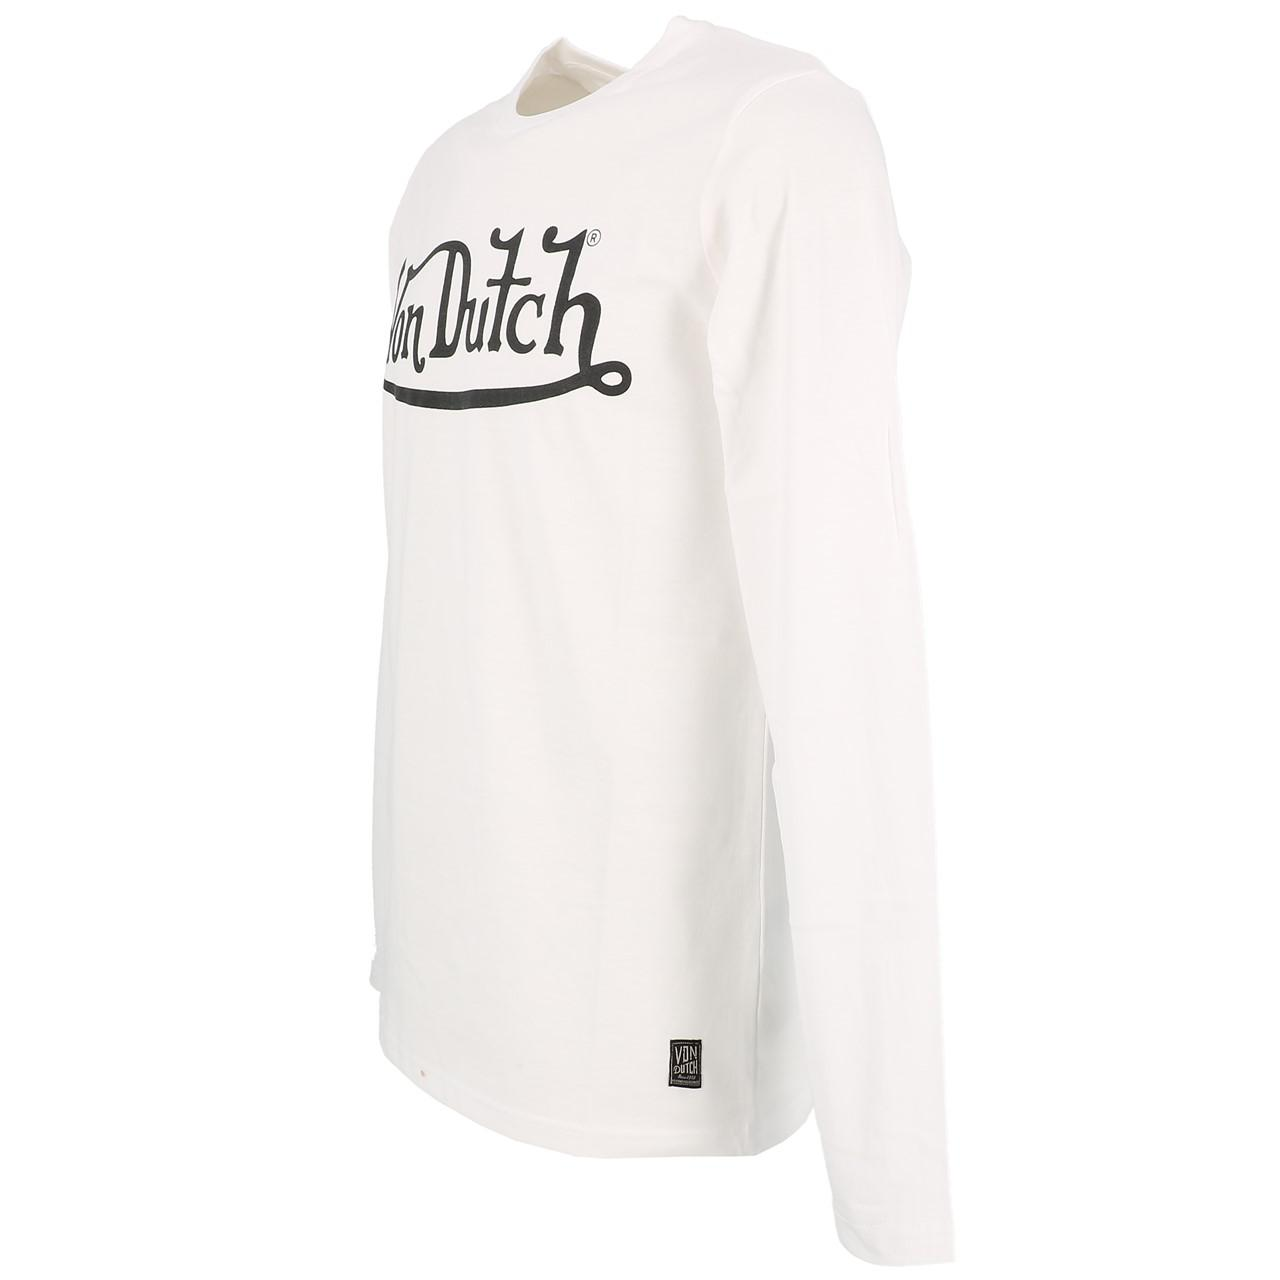 T-Shirt-Von-dutch-Boss-White-ML-Tee-White-91359-New thumbnail 4